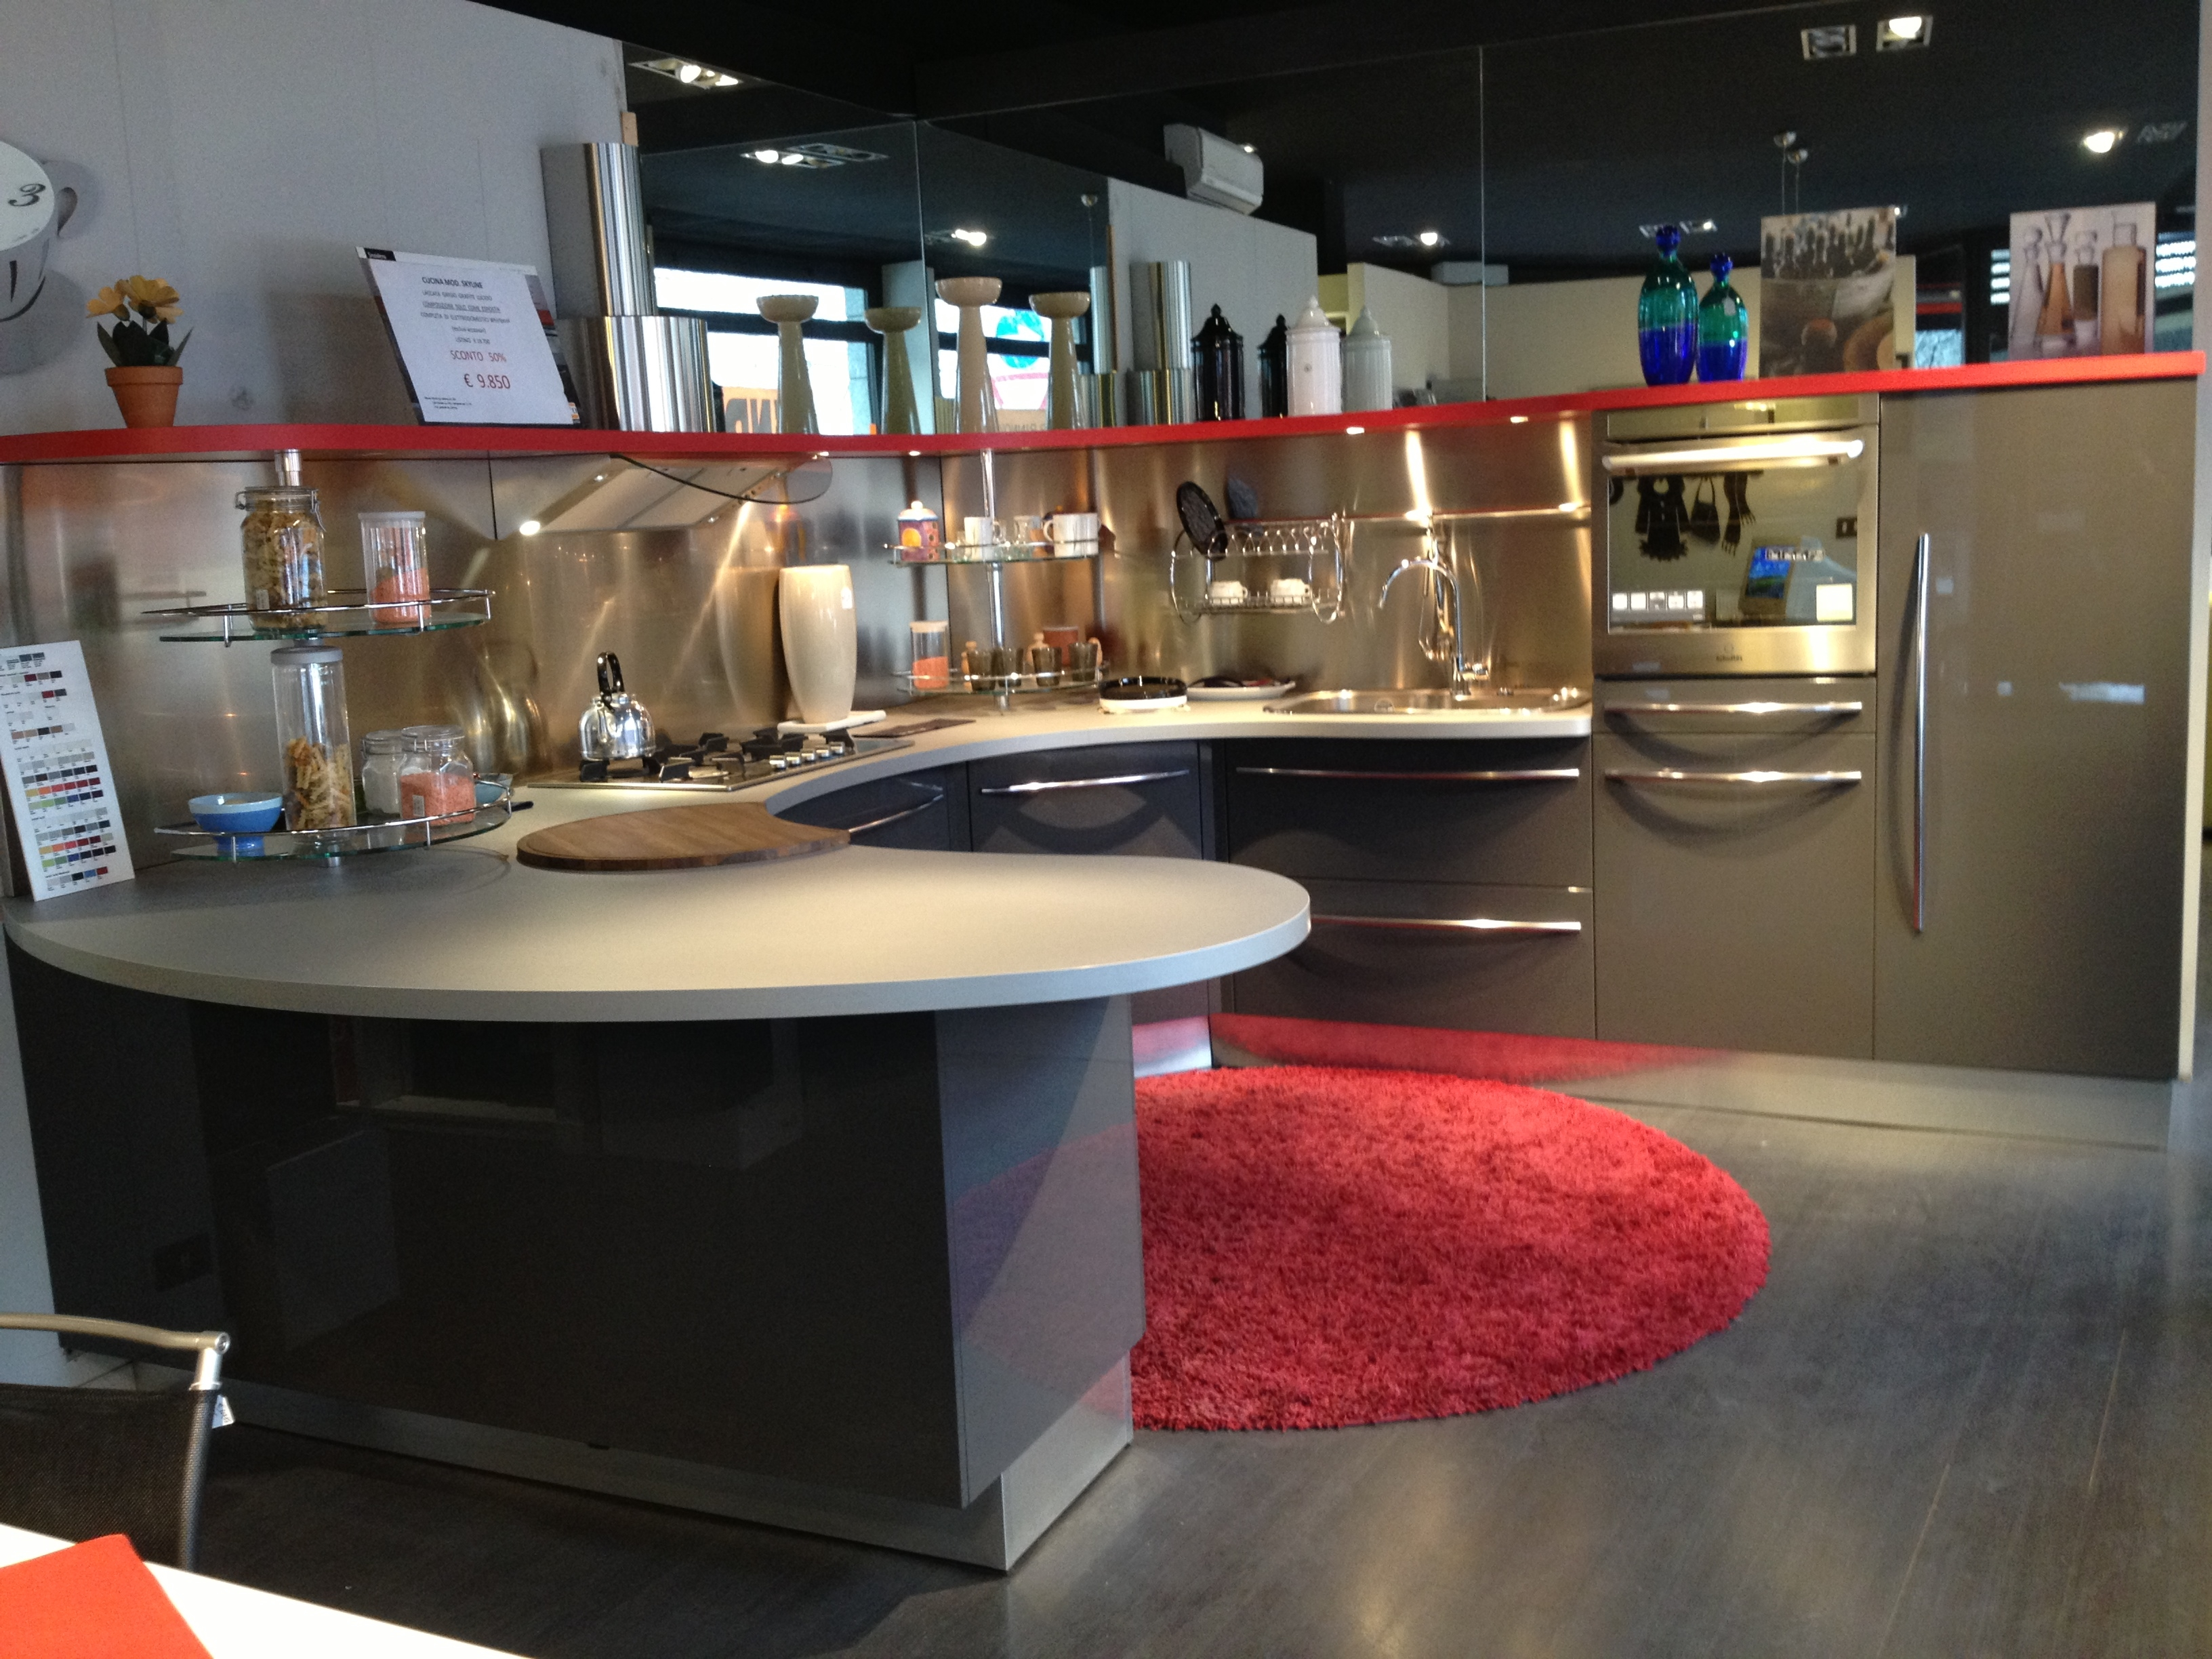 Cucine Moderne A Due Colori  madgeweb.com idee di interior design